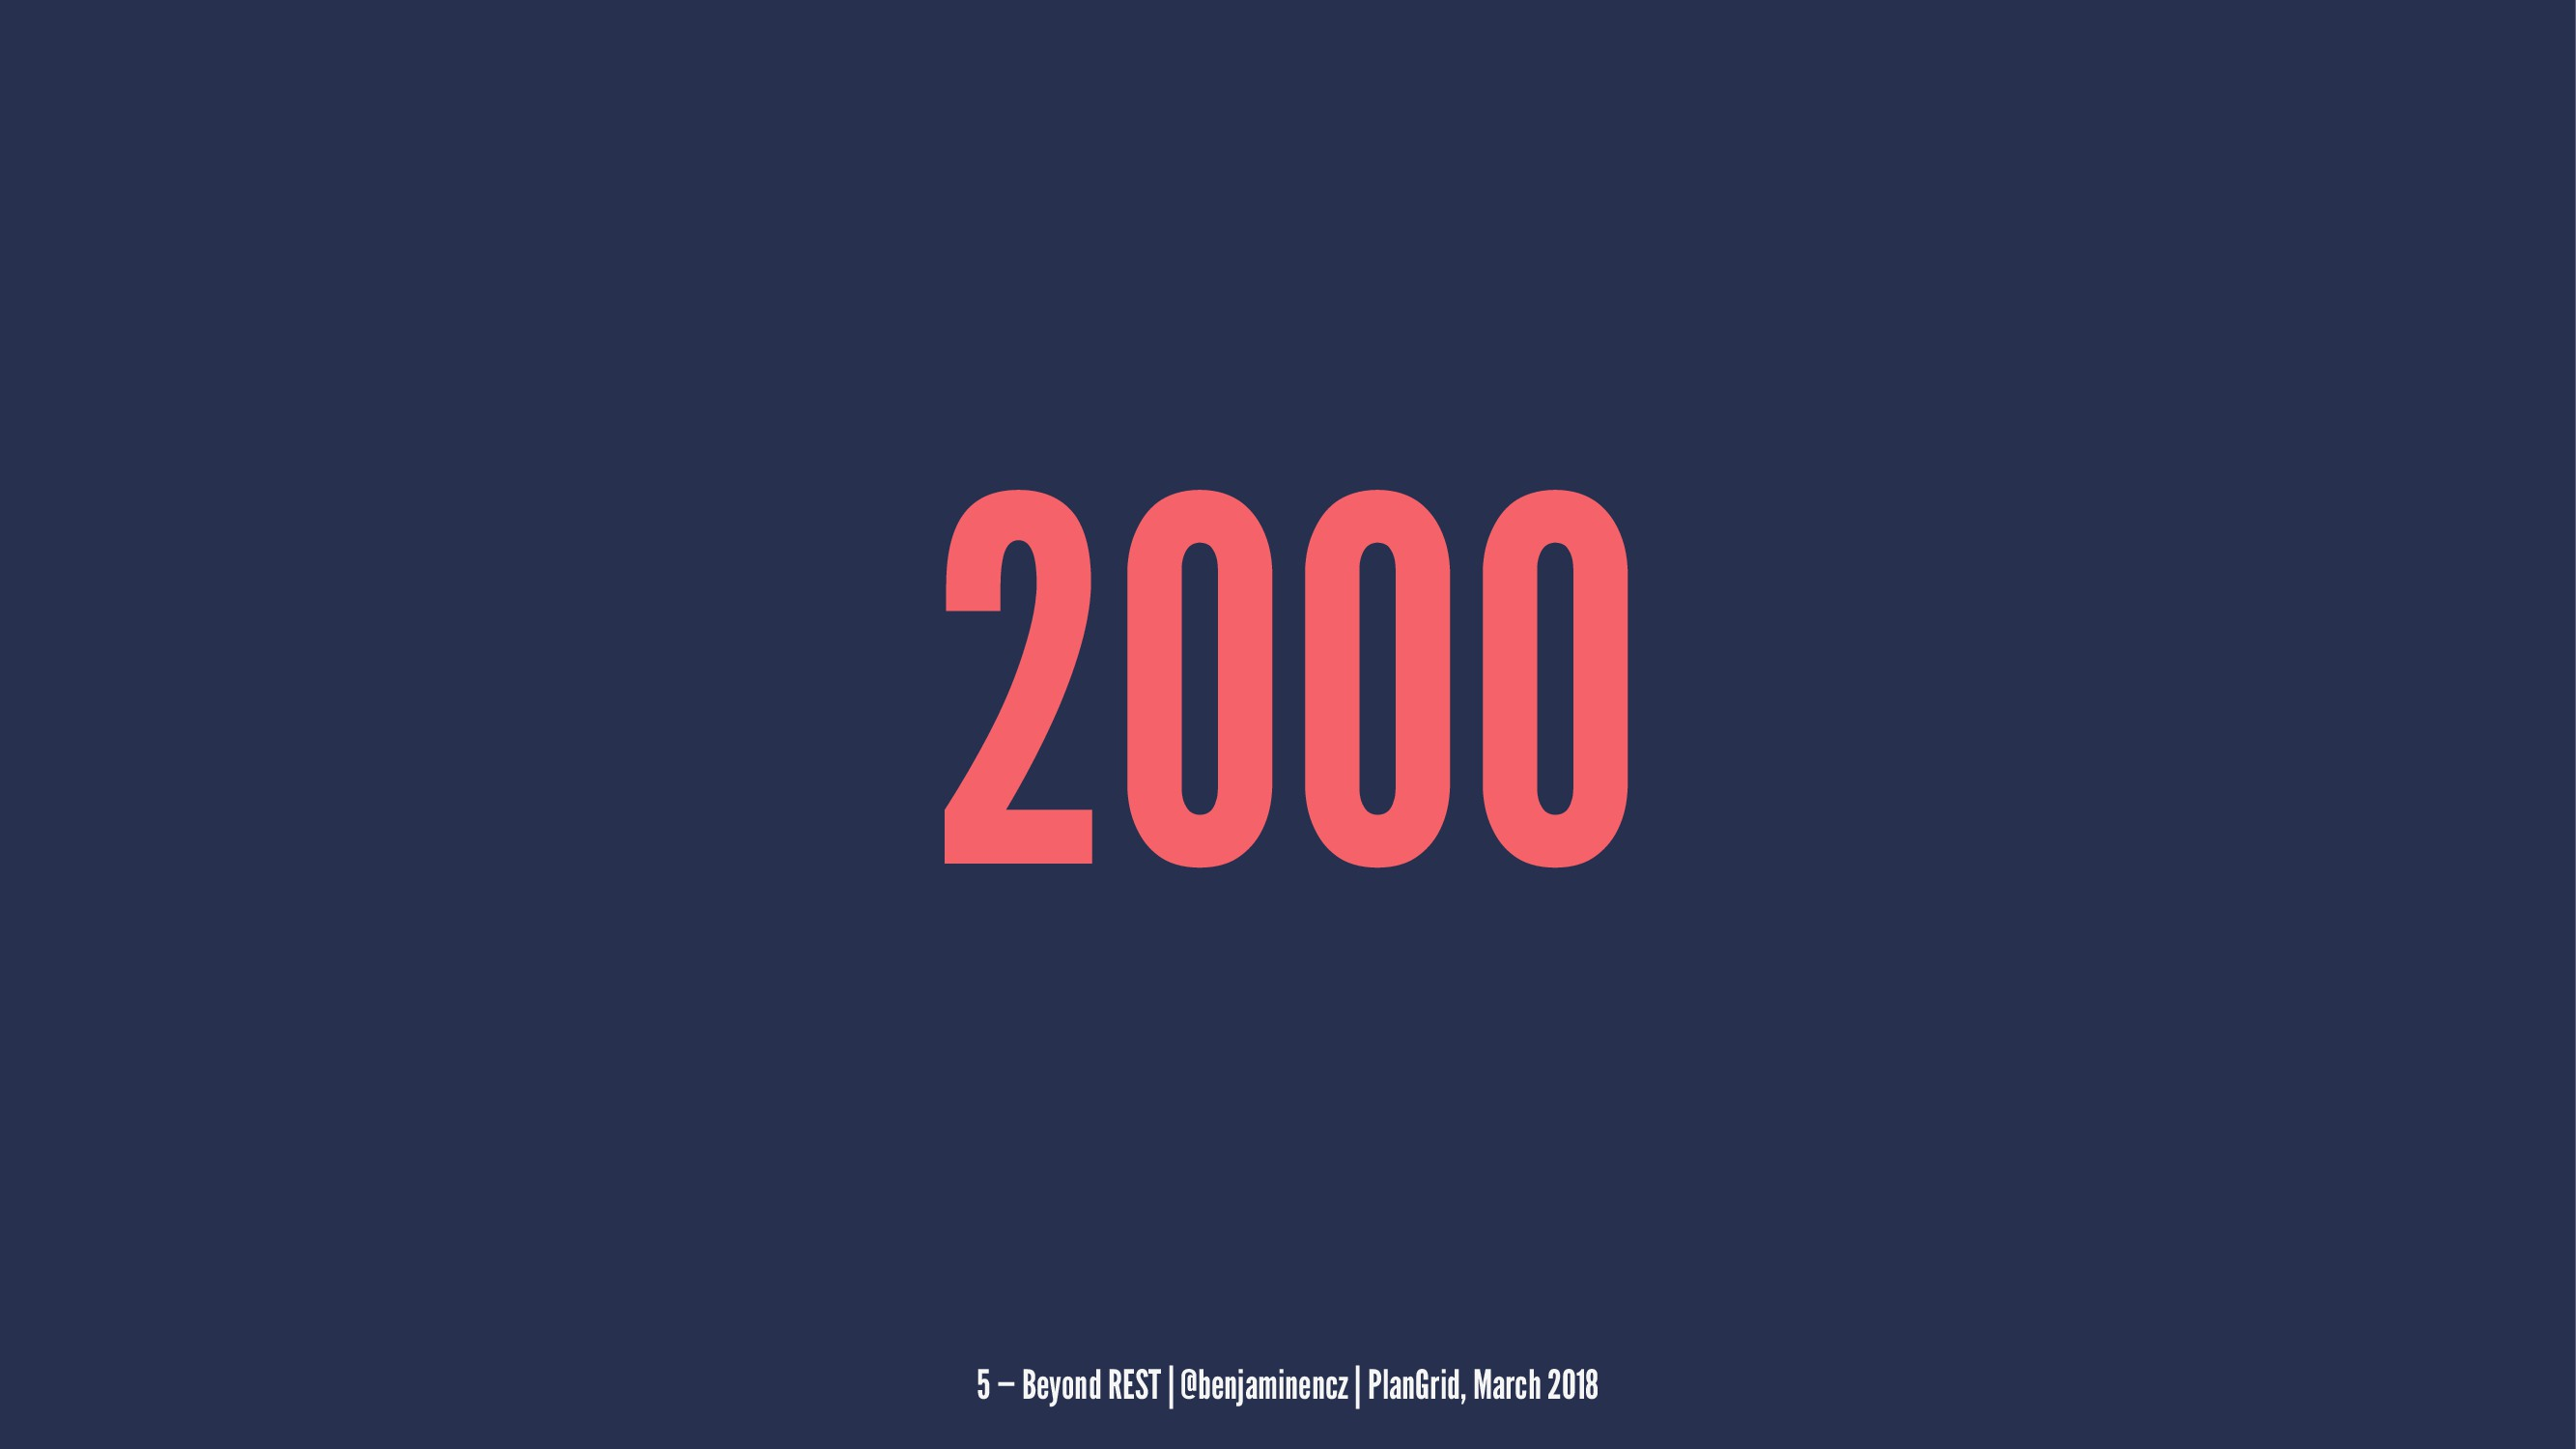 2000 5 — Beyond REST | @benjaminencz | PlanGrid...